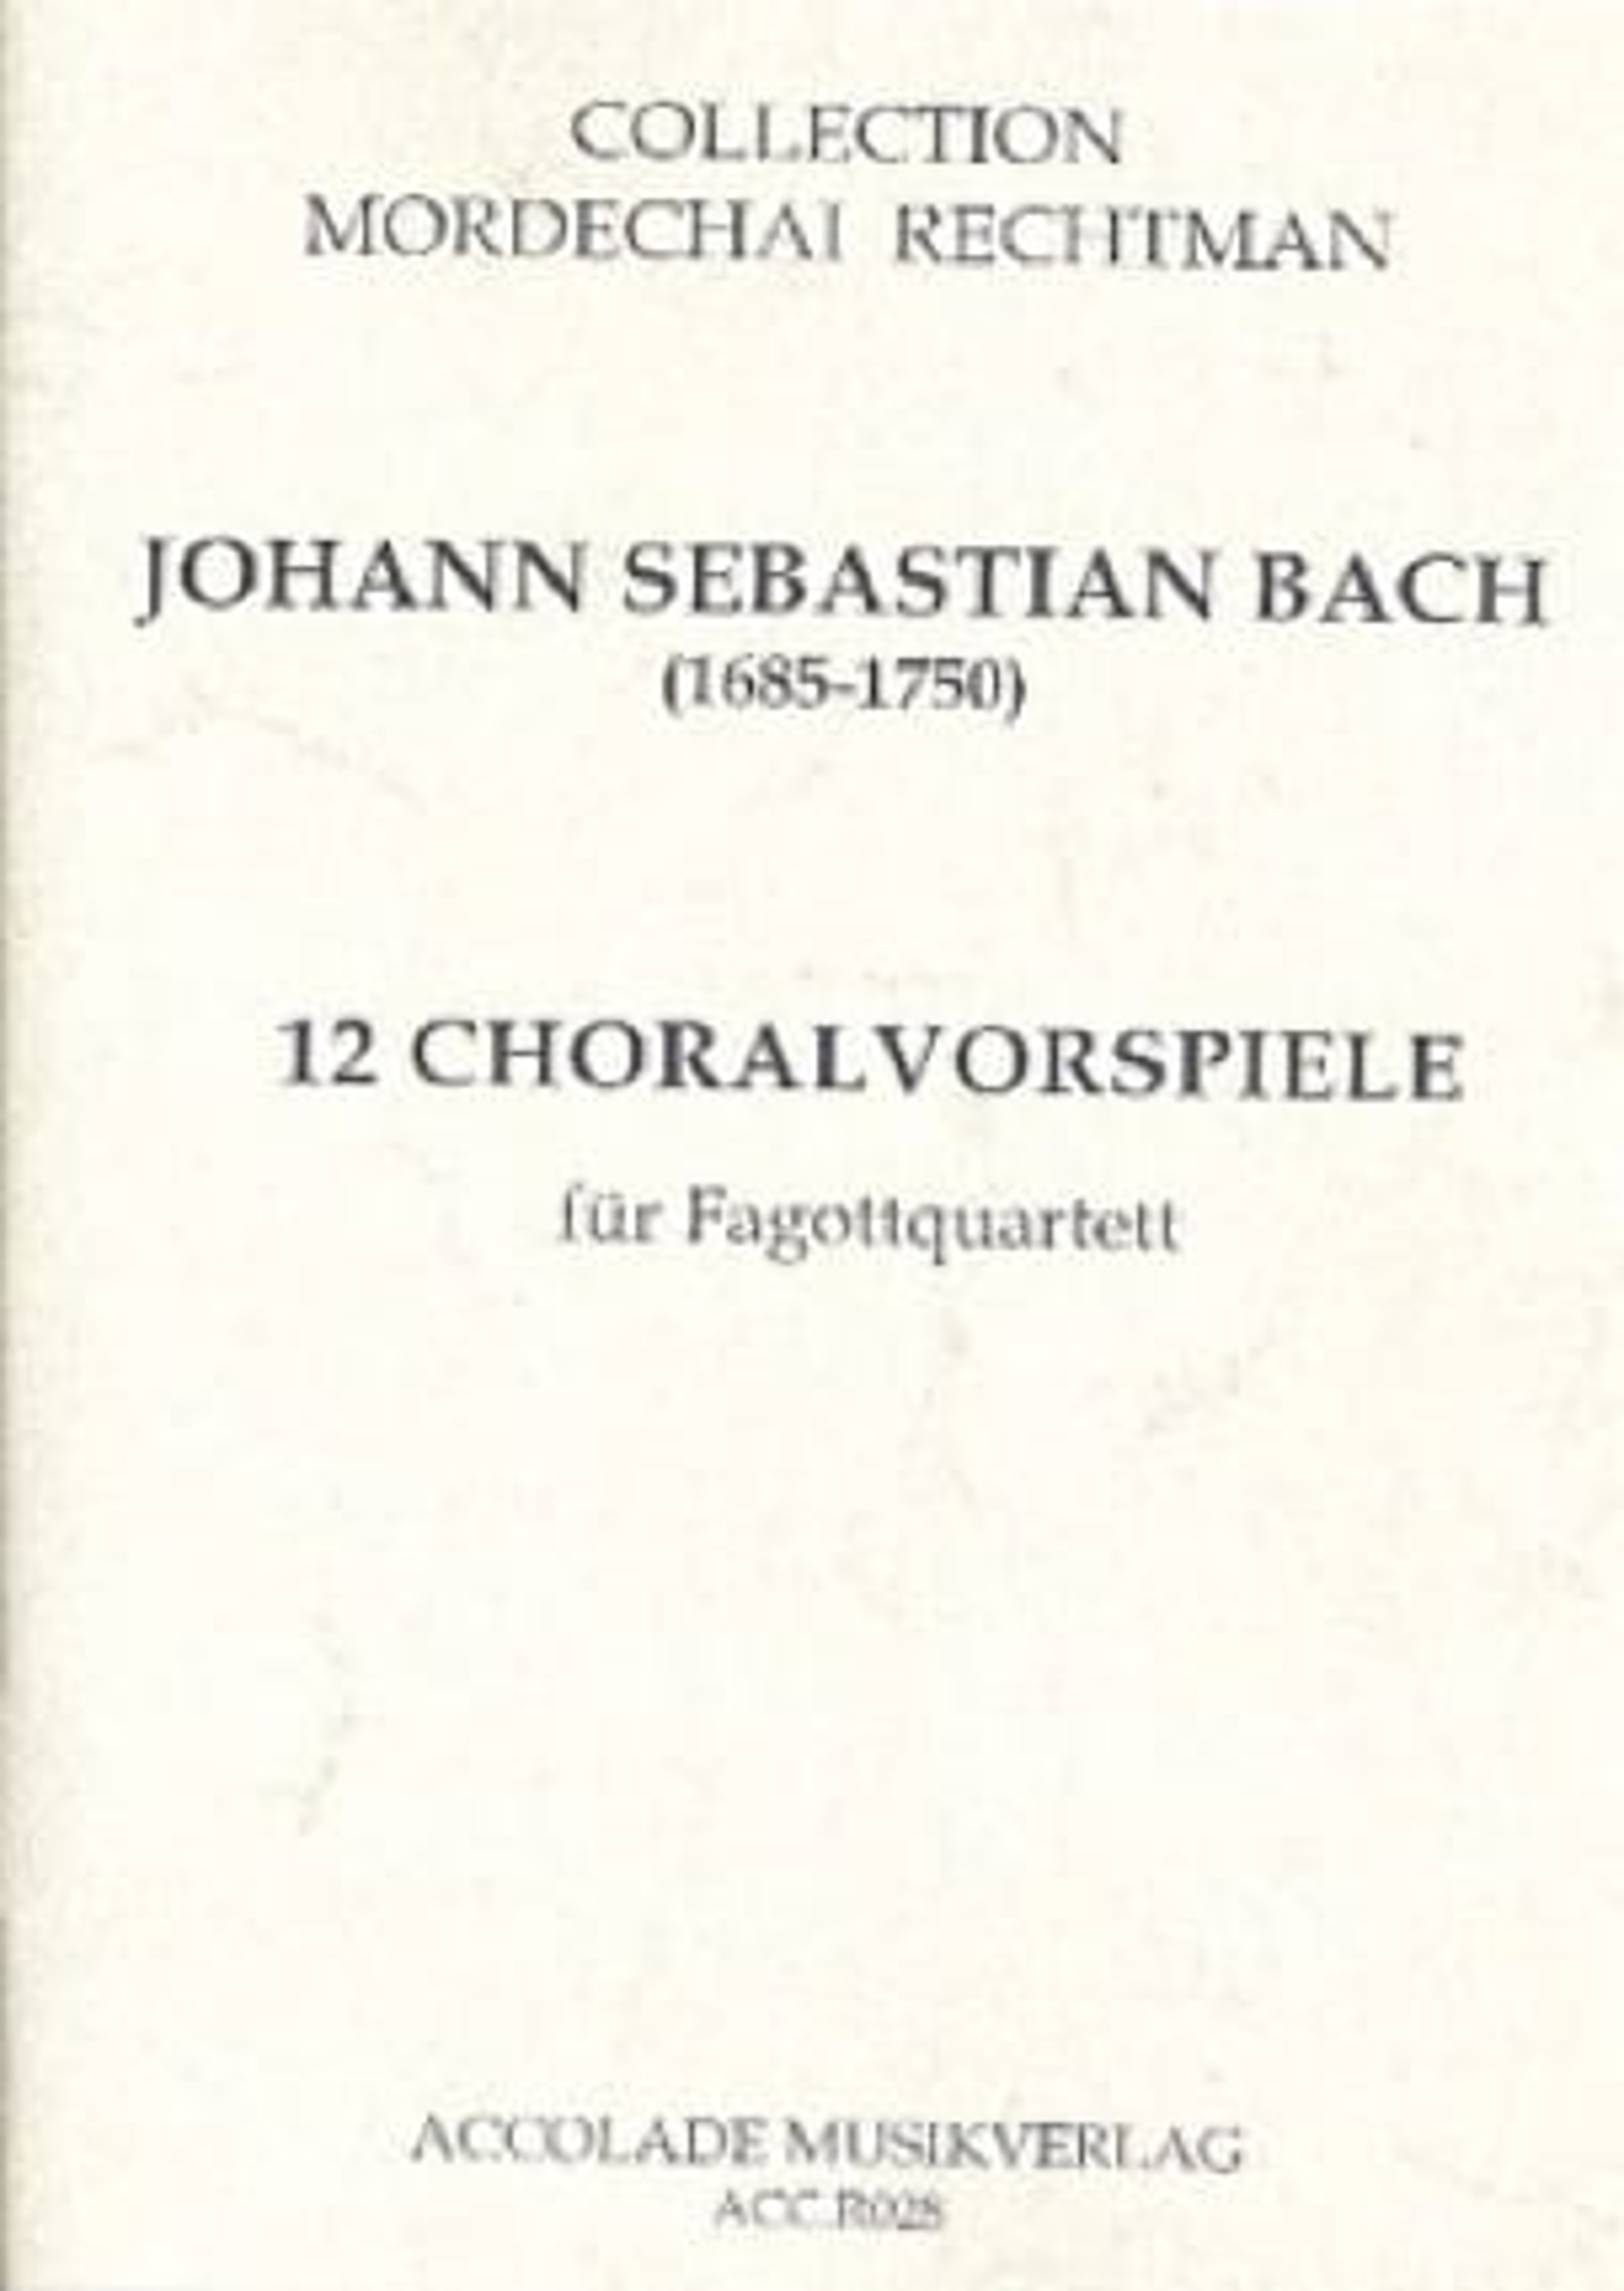 12 Choralvorspiele - Partitur mit Stimmen - BACH - laflutedepan.com